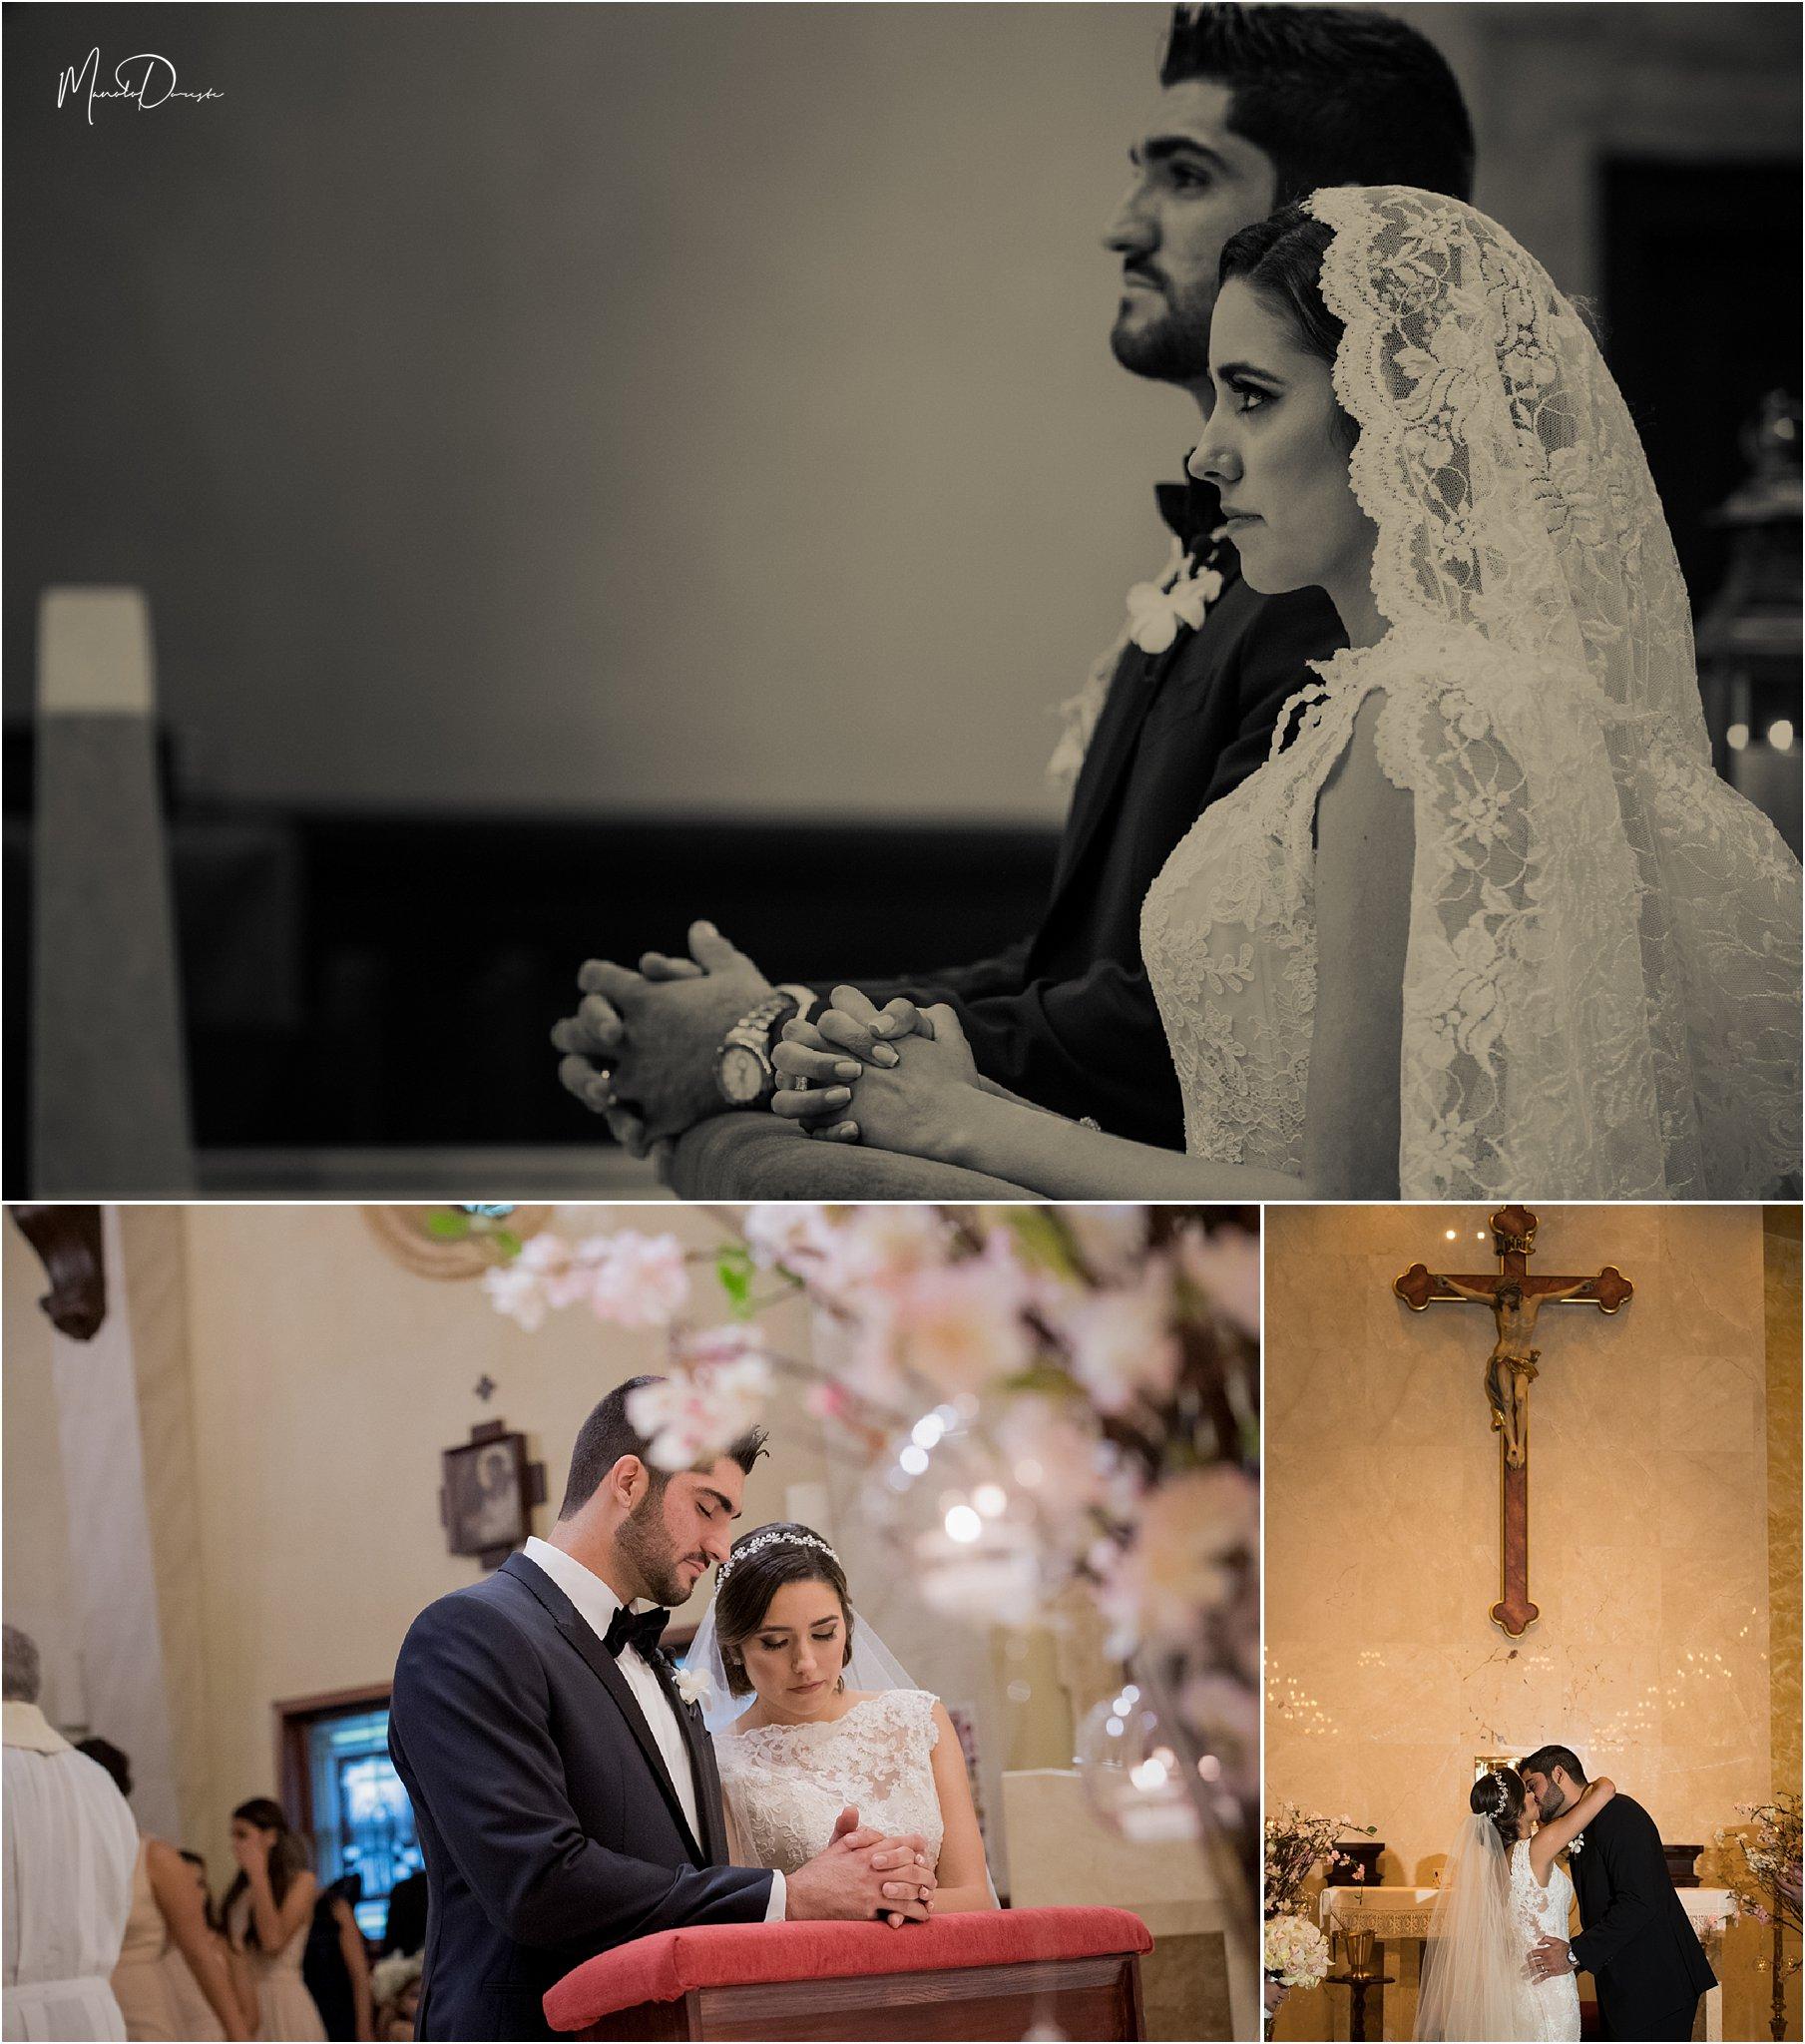 00938_ManoloDoreste_InFocusStudios_Wedding_Family_Photography_Miami_MiamiPhotographer.jpg